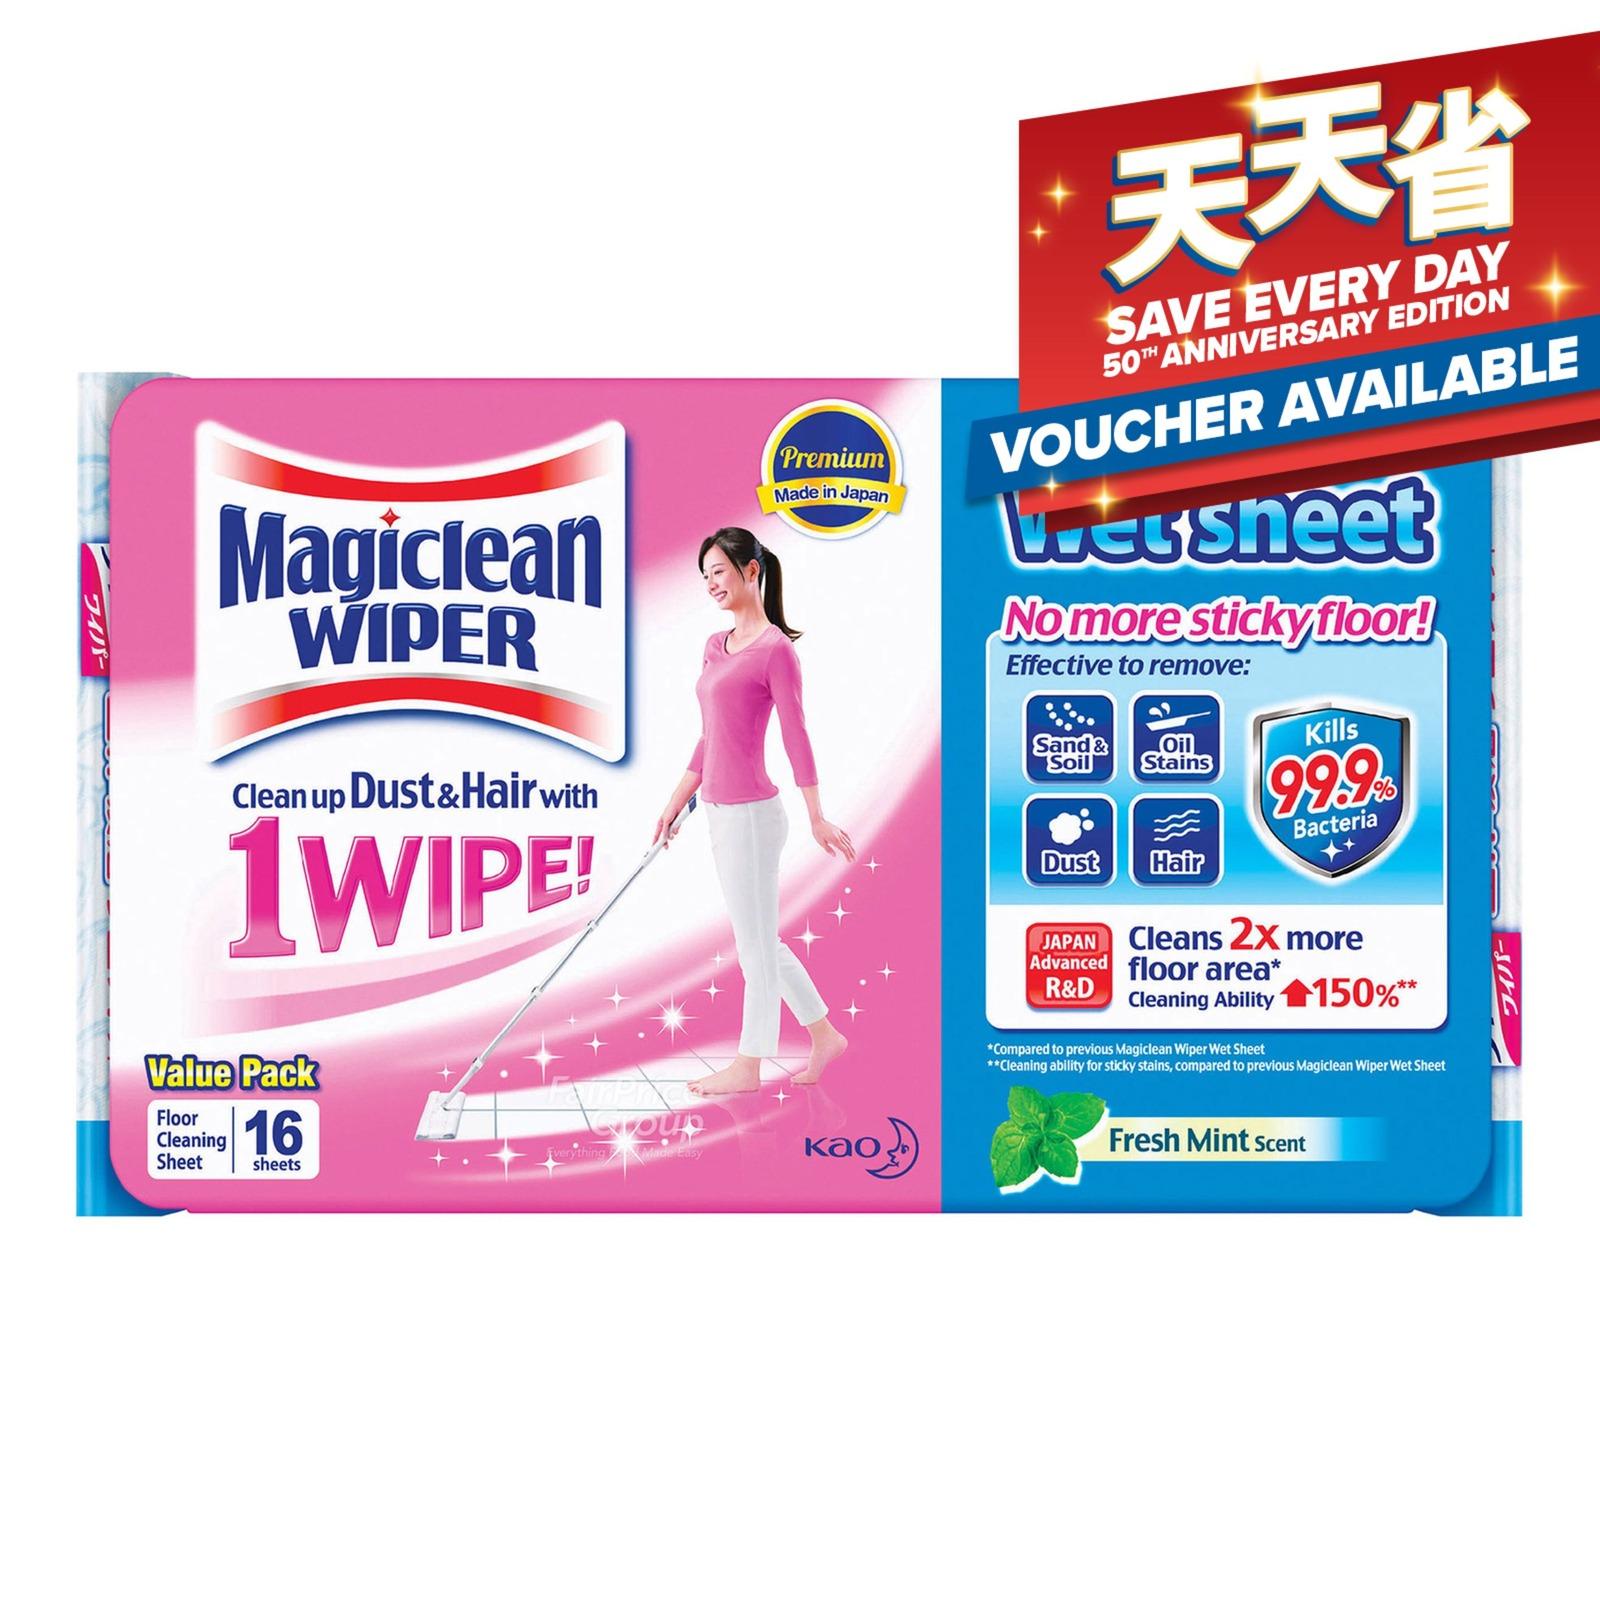 Magiclean Wiper Wet Sheet - Fresh Mint